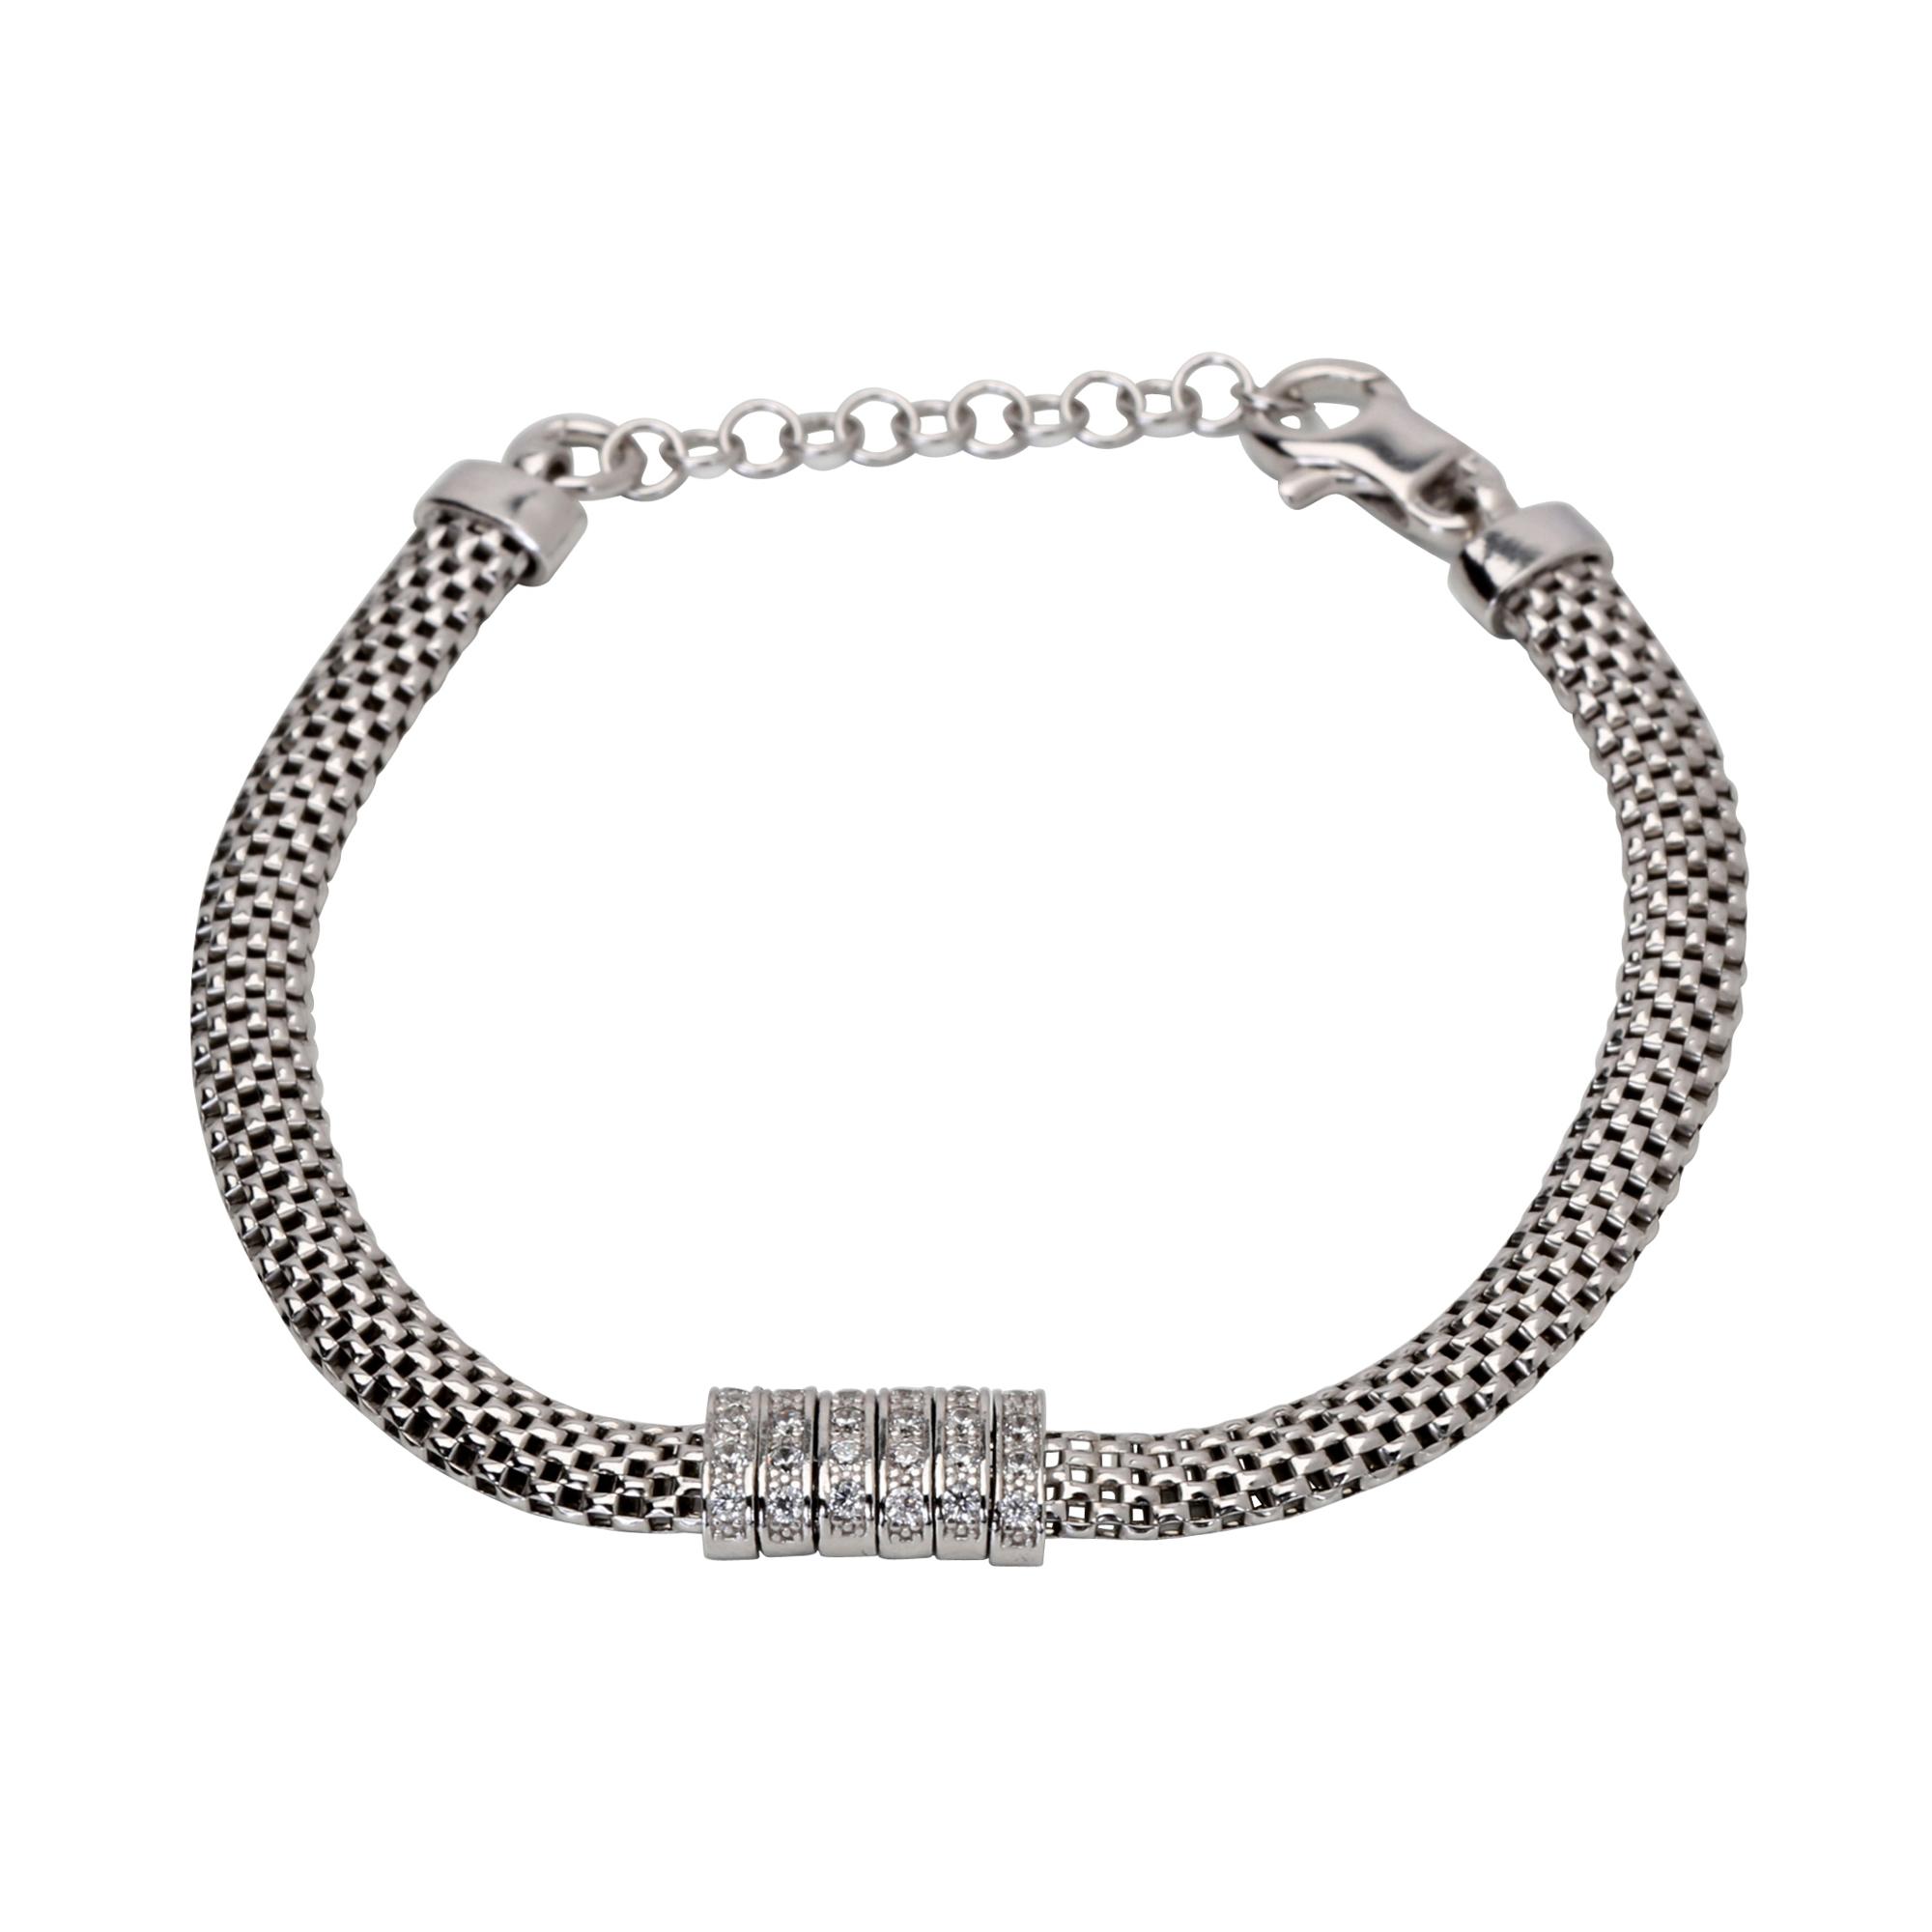 11b9d73a12e70c Details about Links of London Sterling Silver & Cubic Zirconia Cleo Element  Bracelet